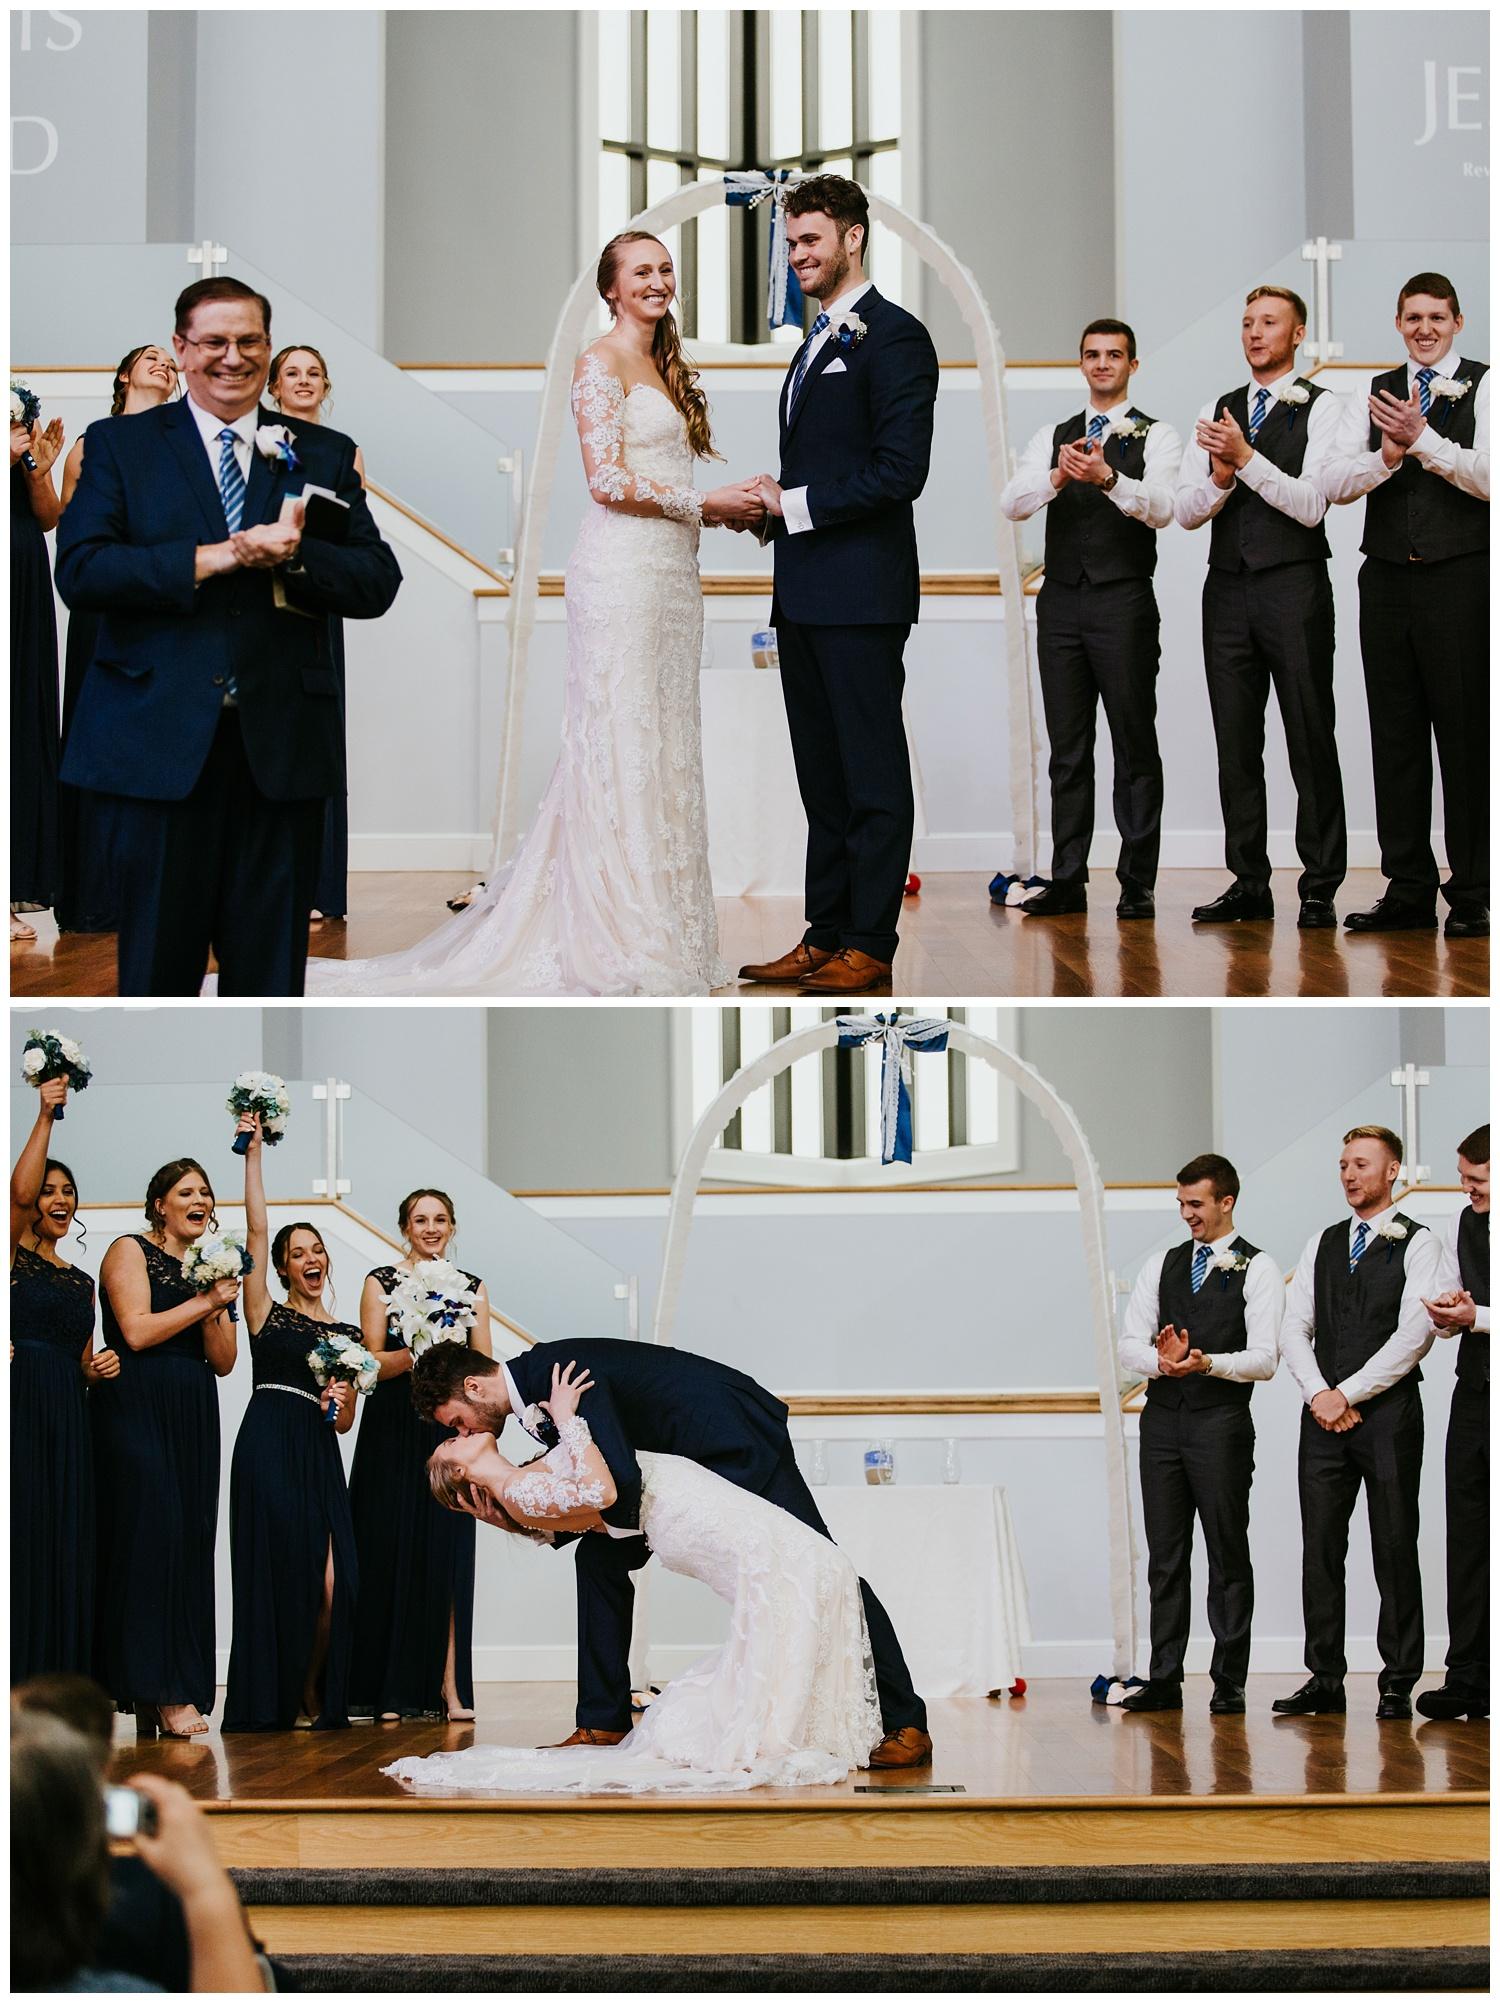 Shadowland Silver Beach St. Joseph Wedding Photographer Rainy Wedding43.jpg